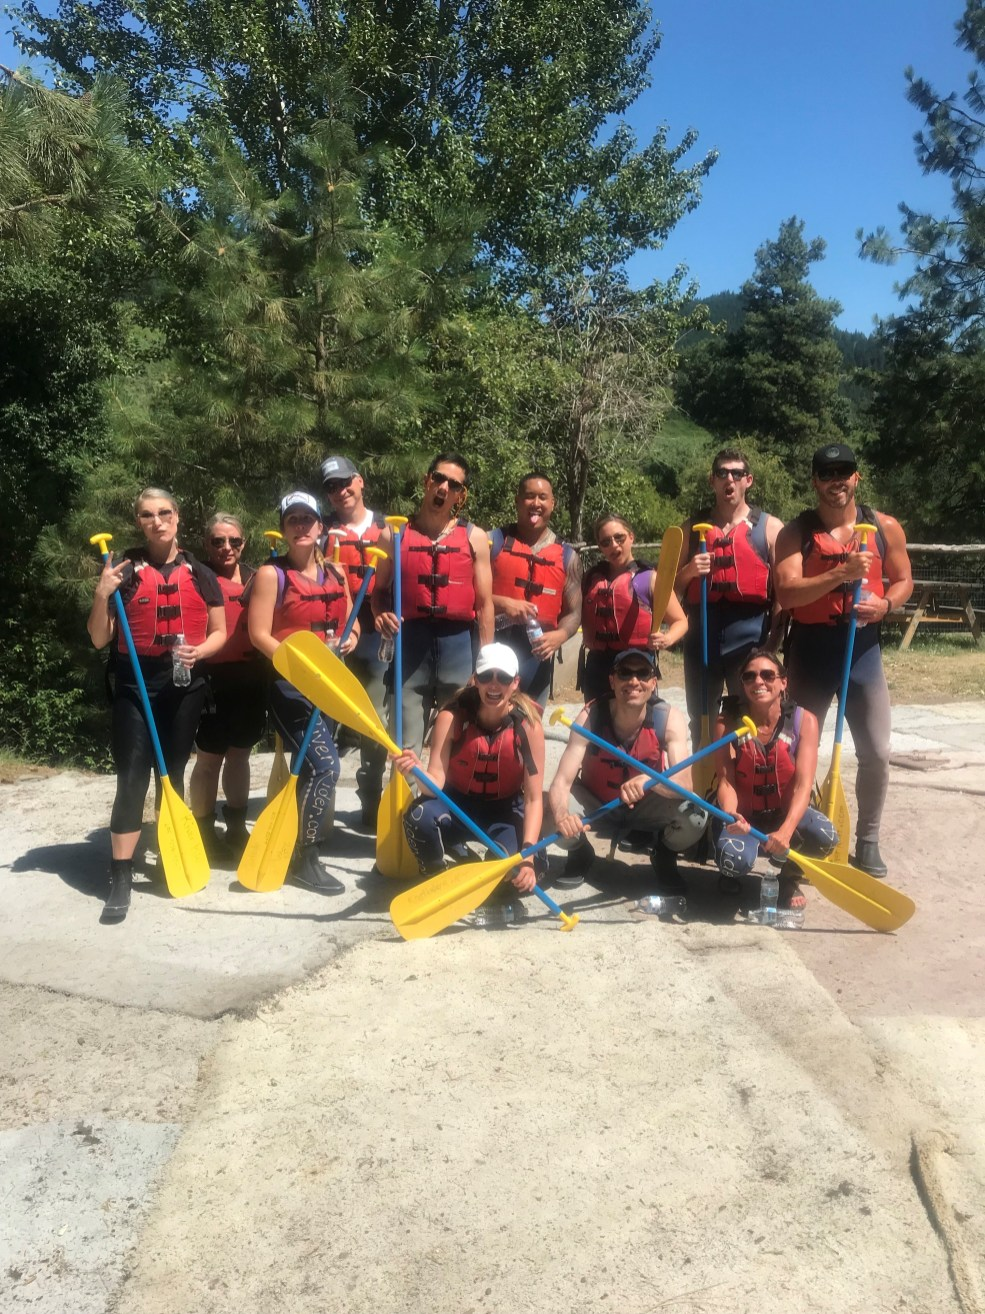 Spectrum 10 Year Anniversary Rafting Trip July 2018